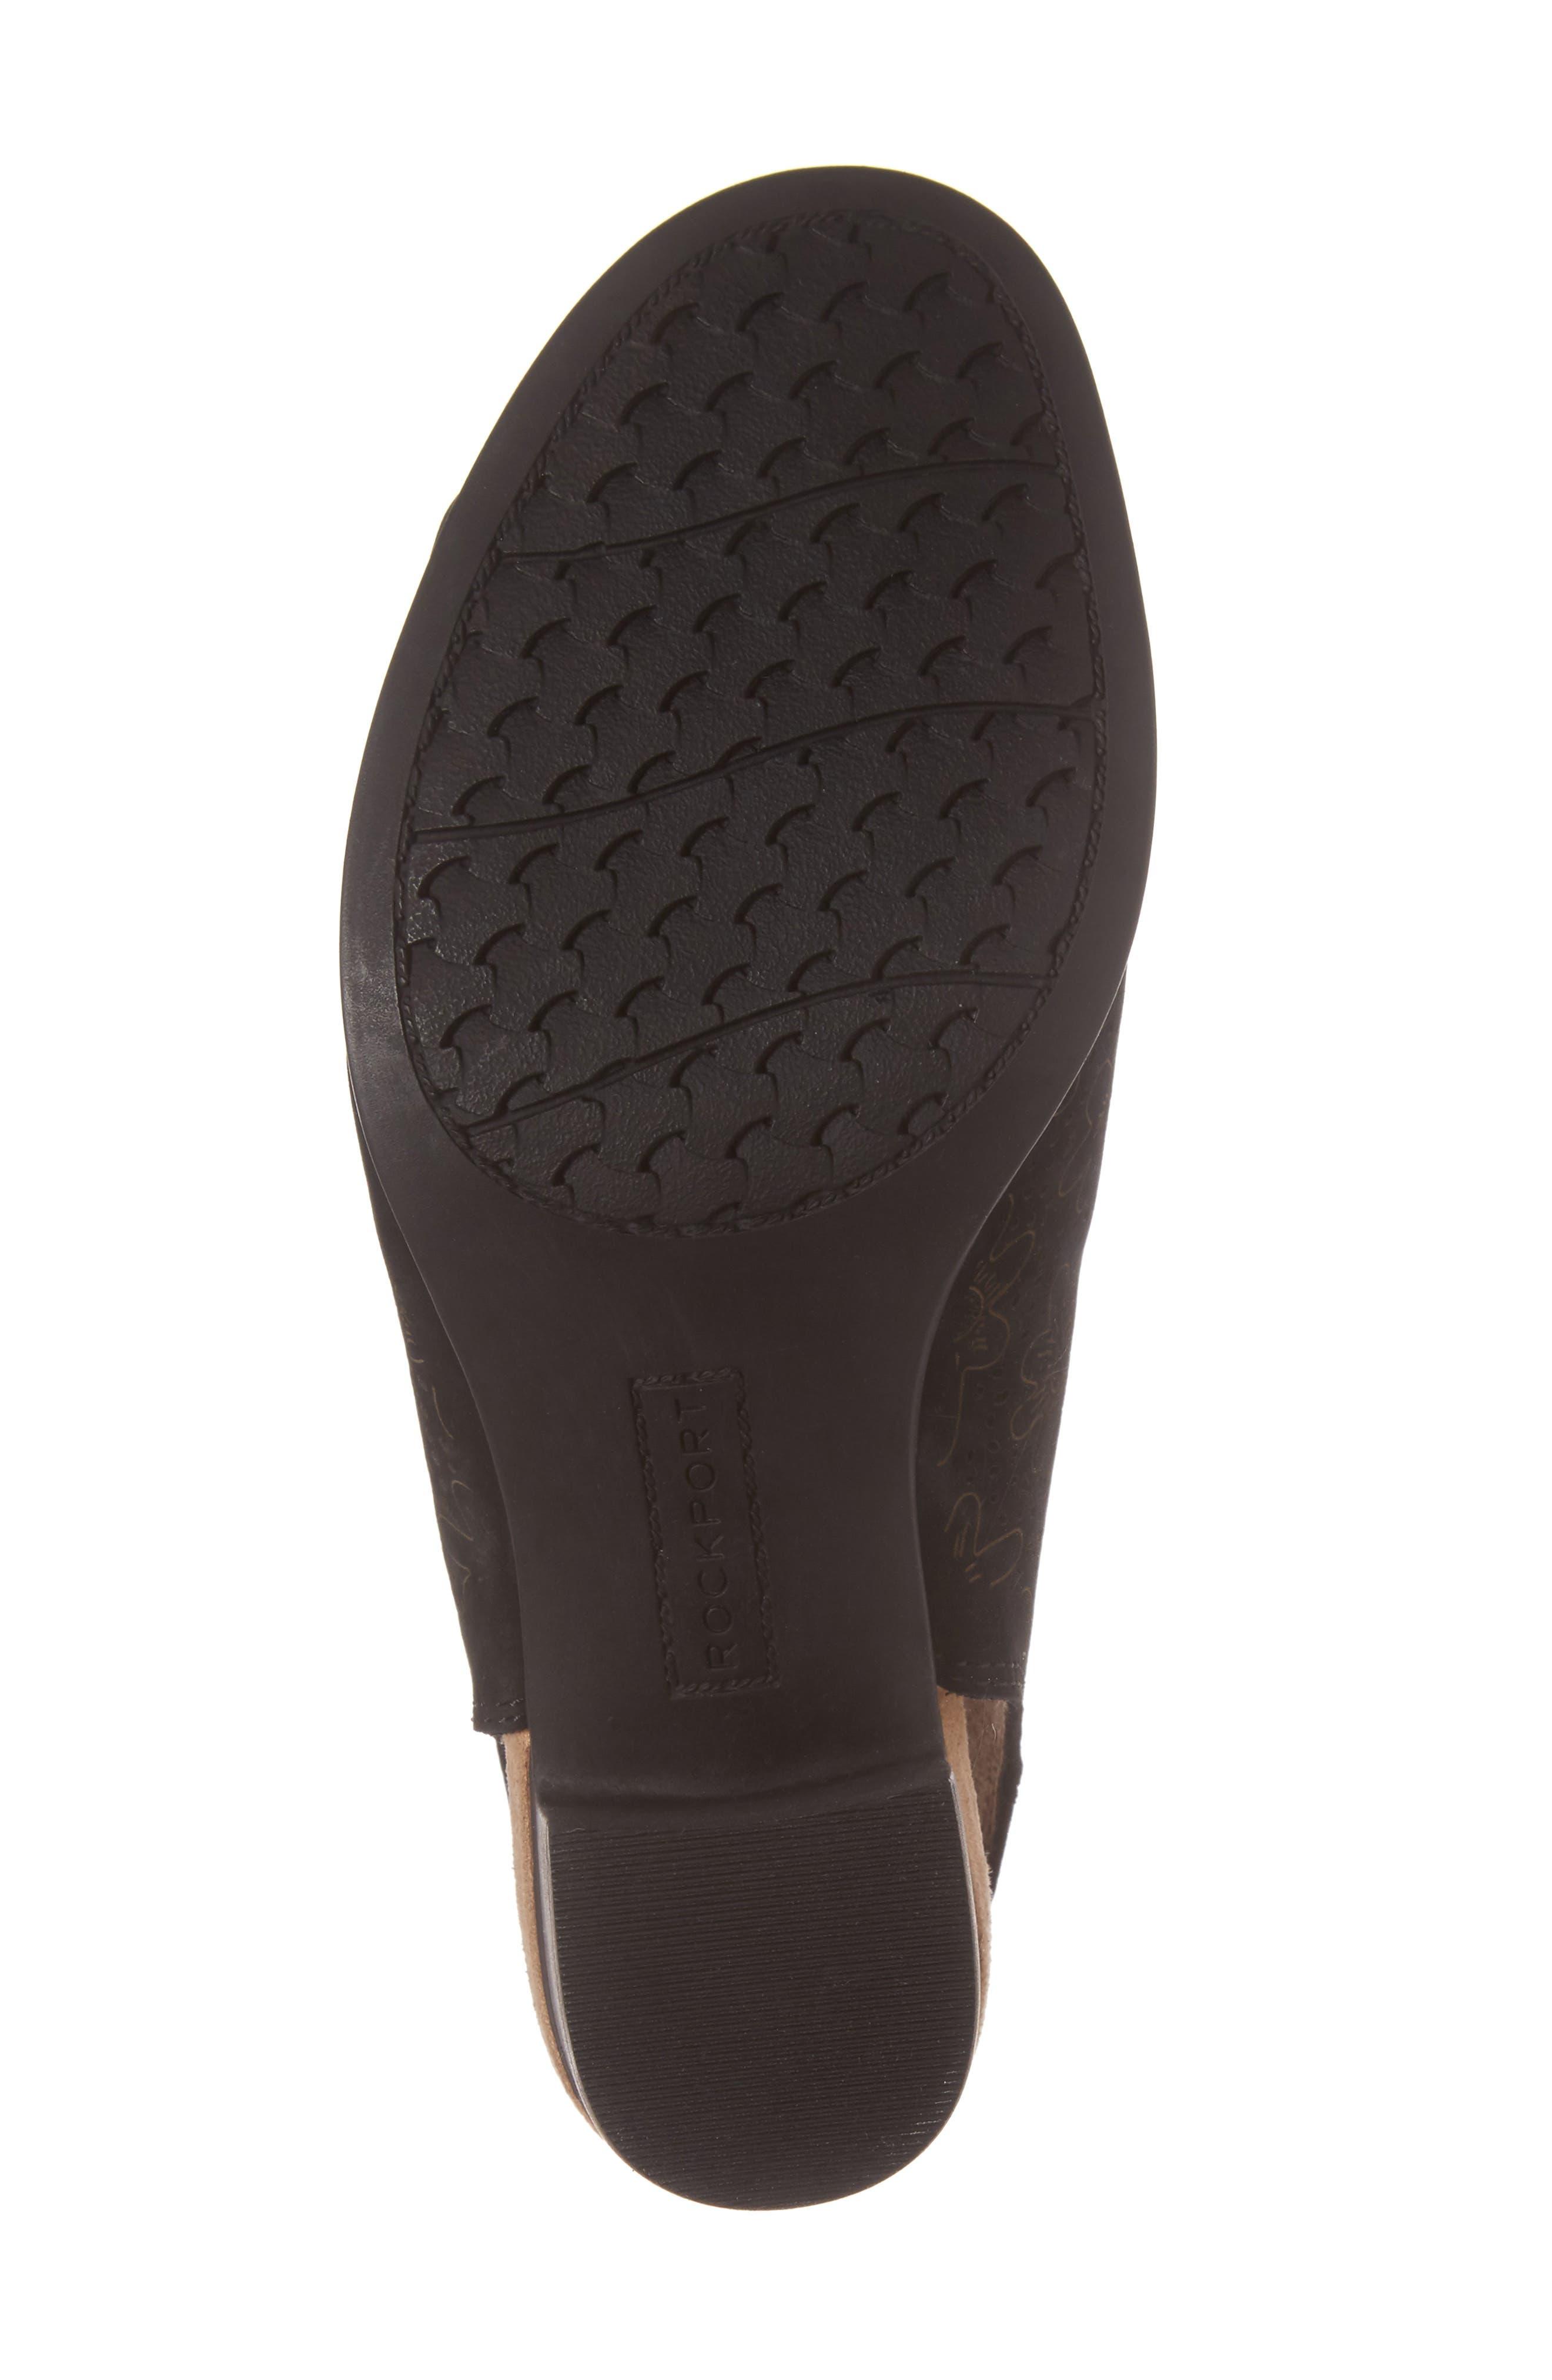 ROCKPORT COBB HILL,                             Hattie Perforated Slingback Sandal,                             Alternate thumbnail 6, color,                             BLACK NUBUCK